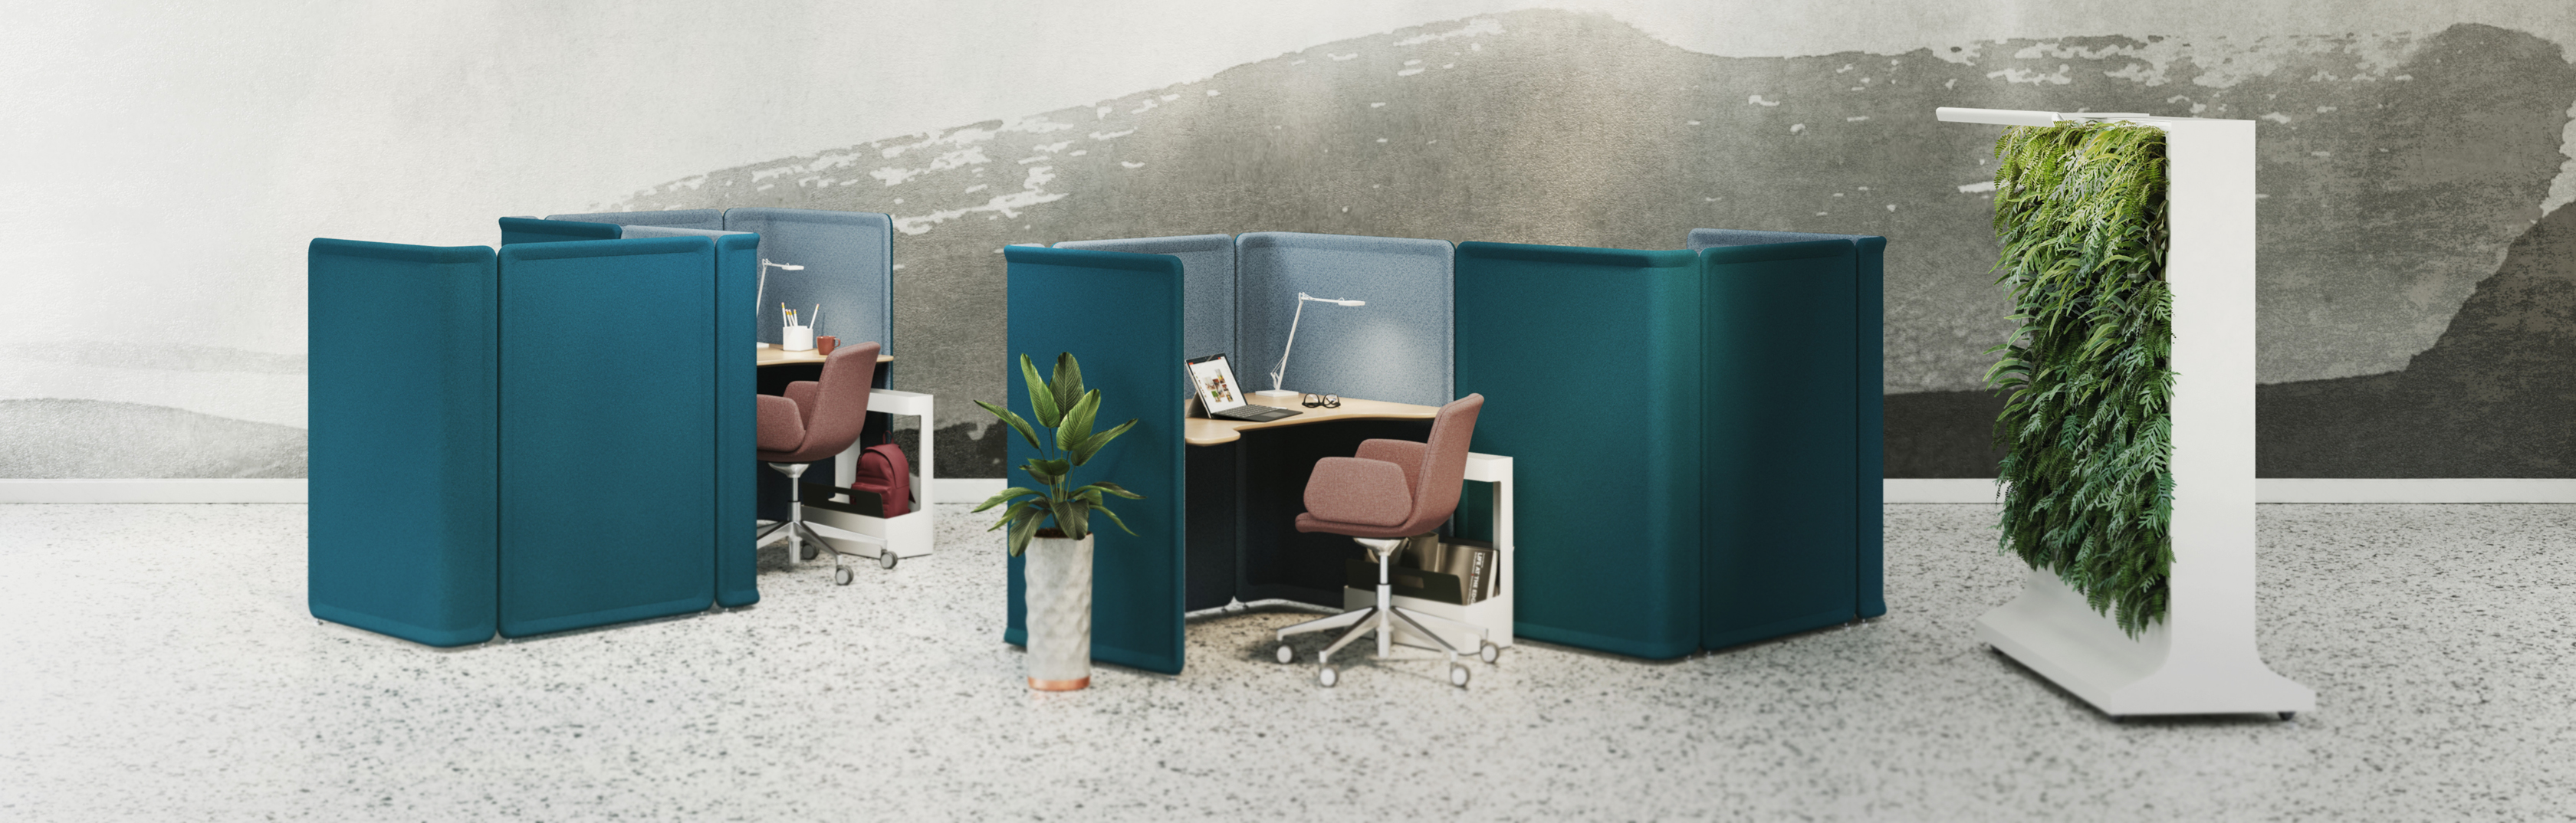 Utah Commercial Interior Design Salt Lake City Office Furniture